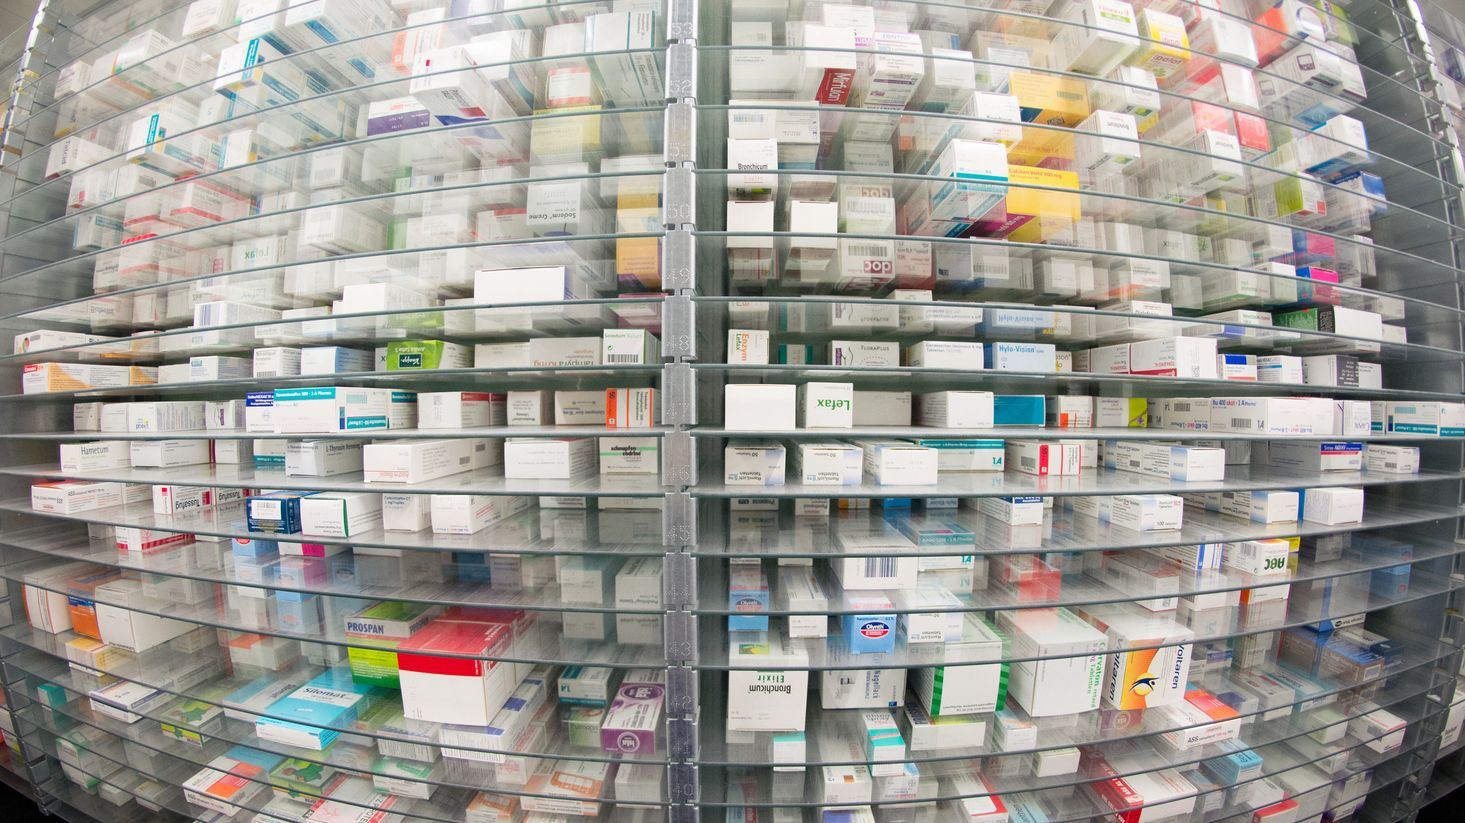 Arzneimittelregal in einer Apotheke